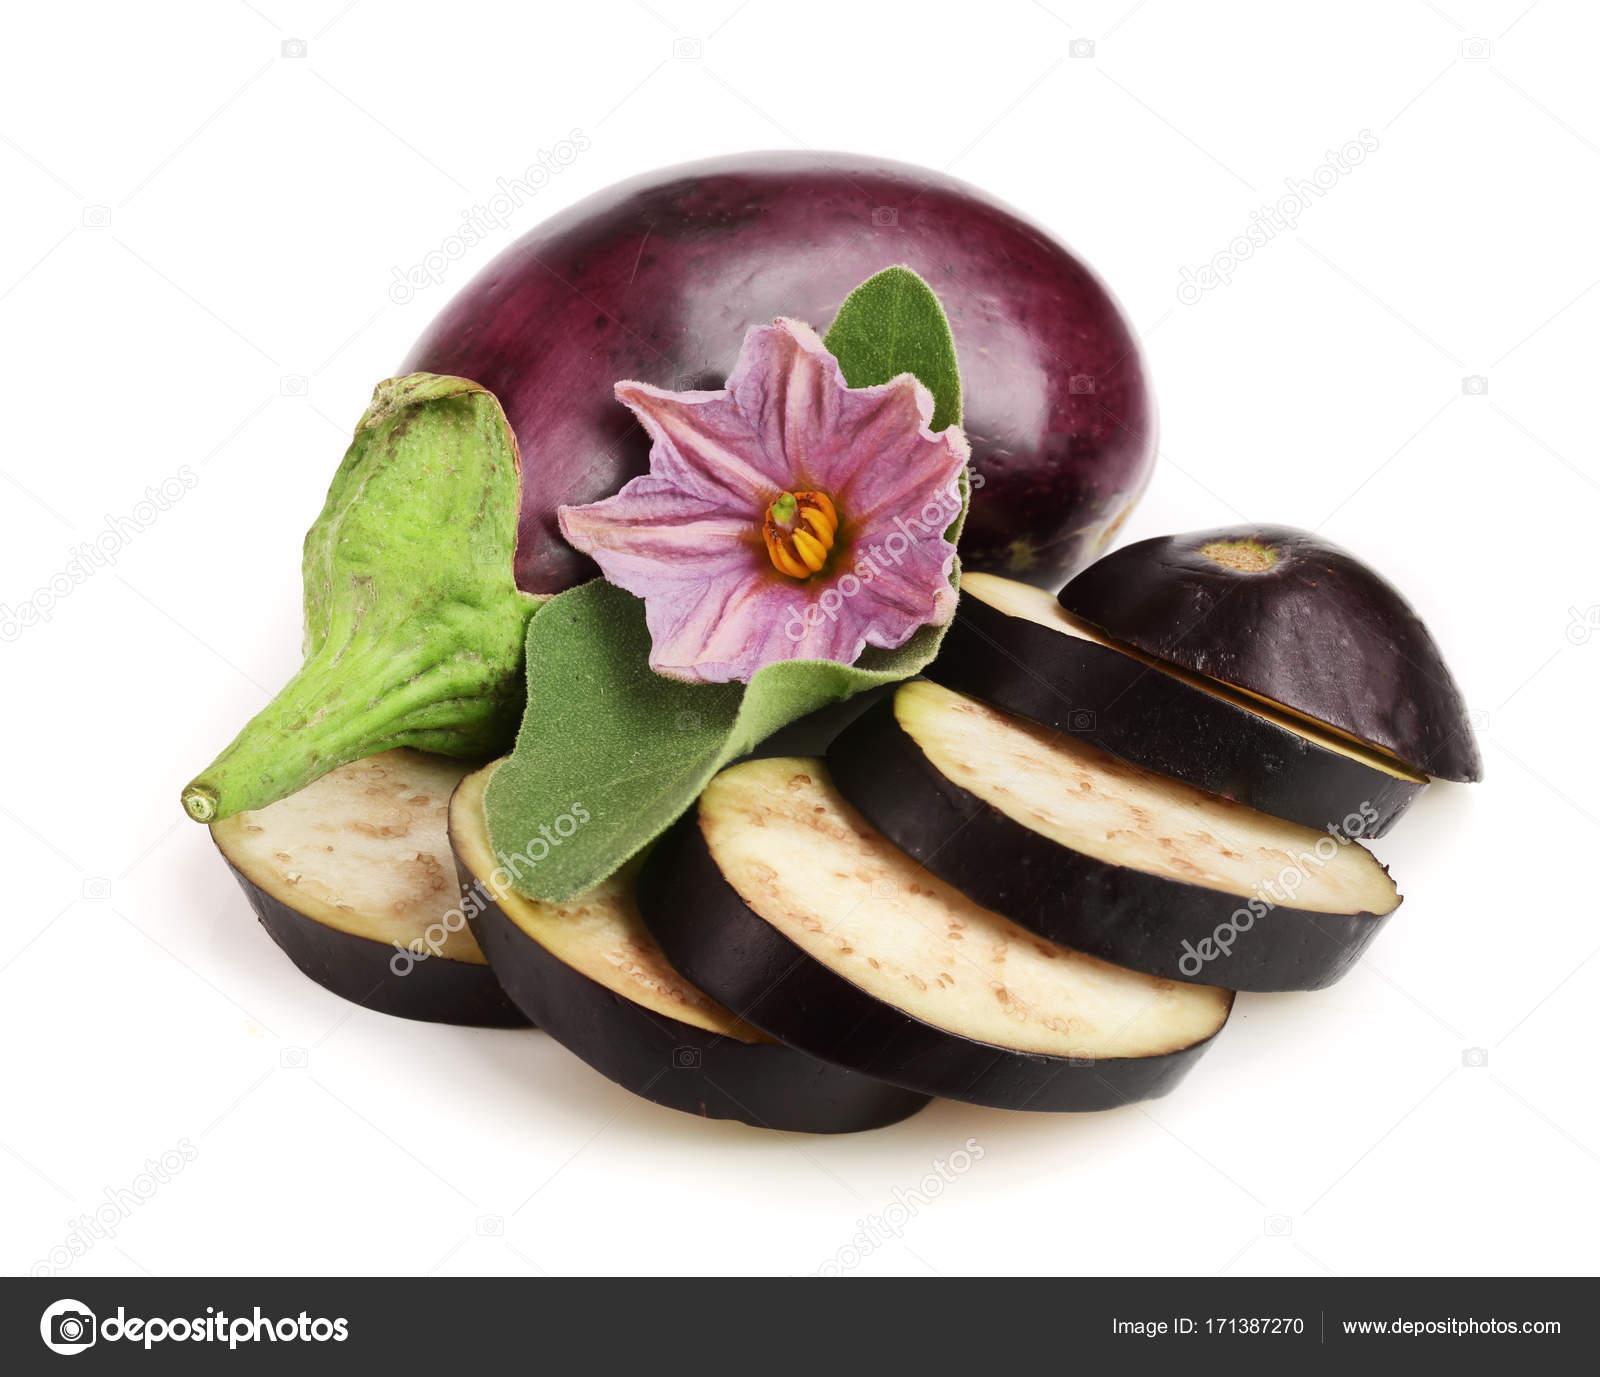 Sliced eggplant or aubergine vegetable with flower isolated on white sliced eggplant or aubergine vegetable with flower isolated on white background stock photo mightylinksfo